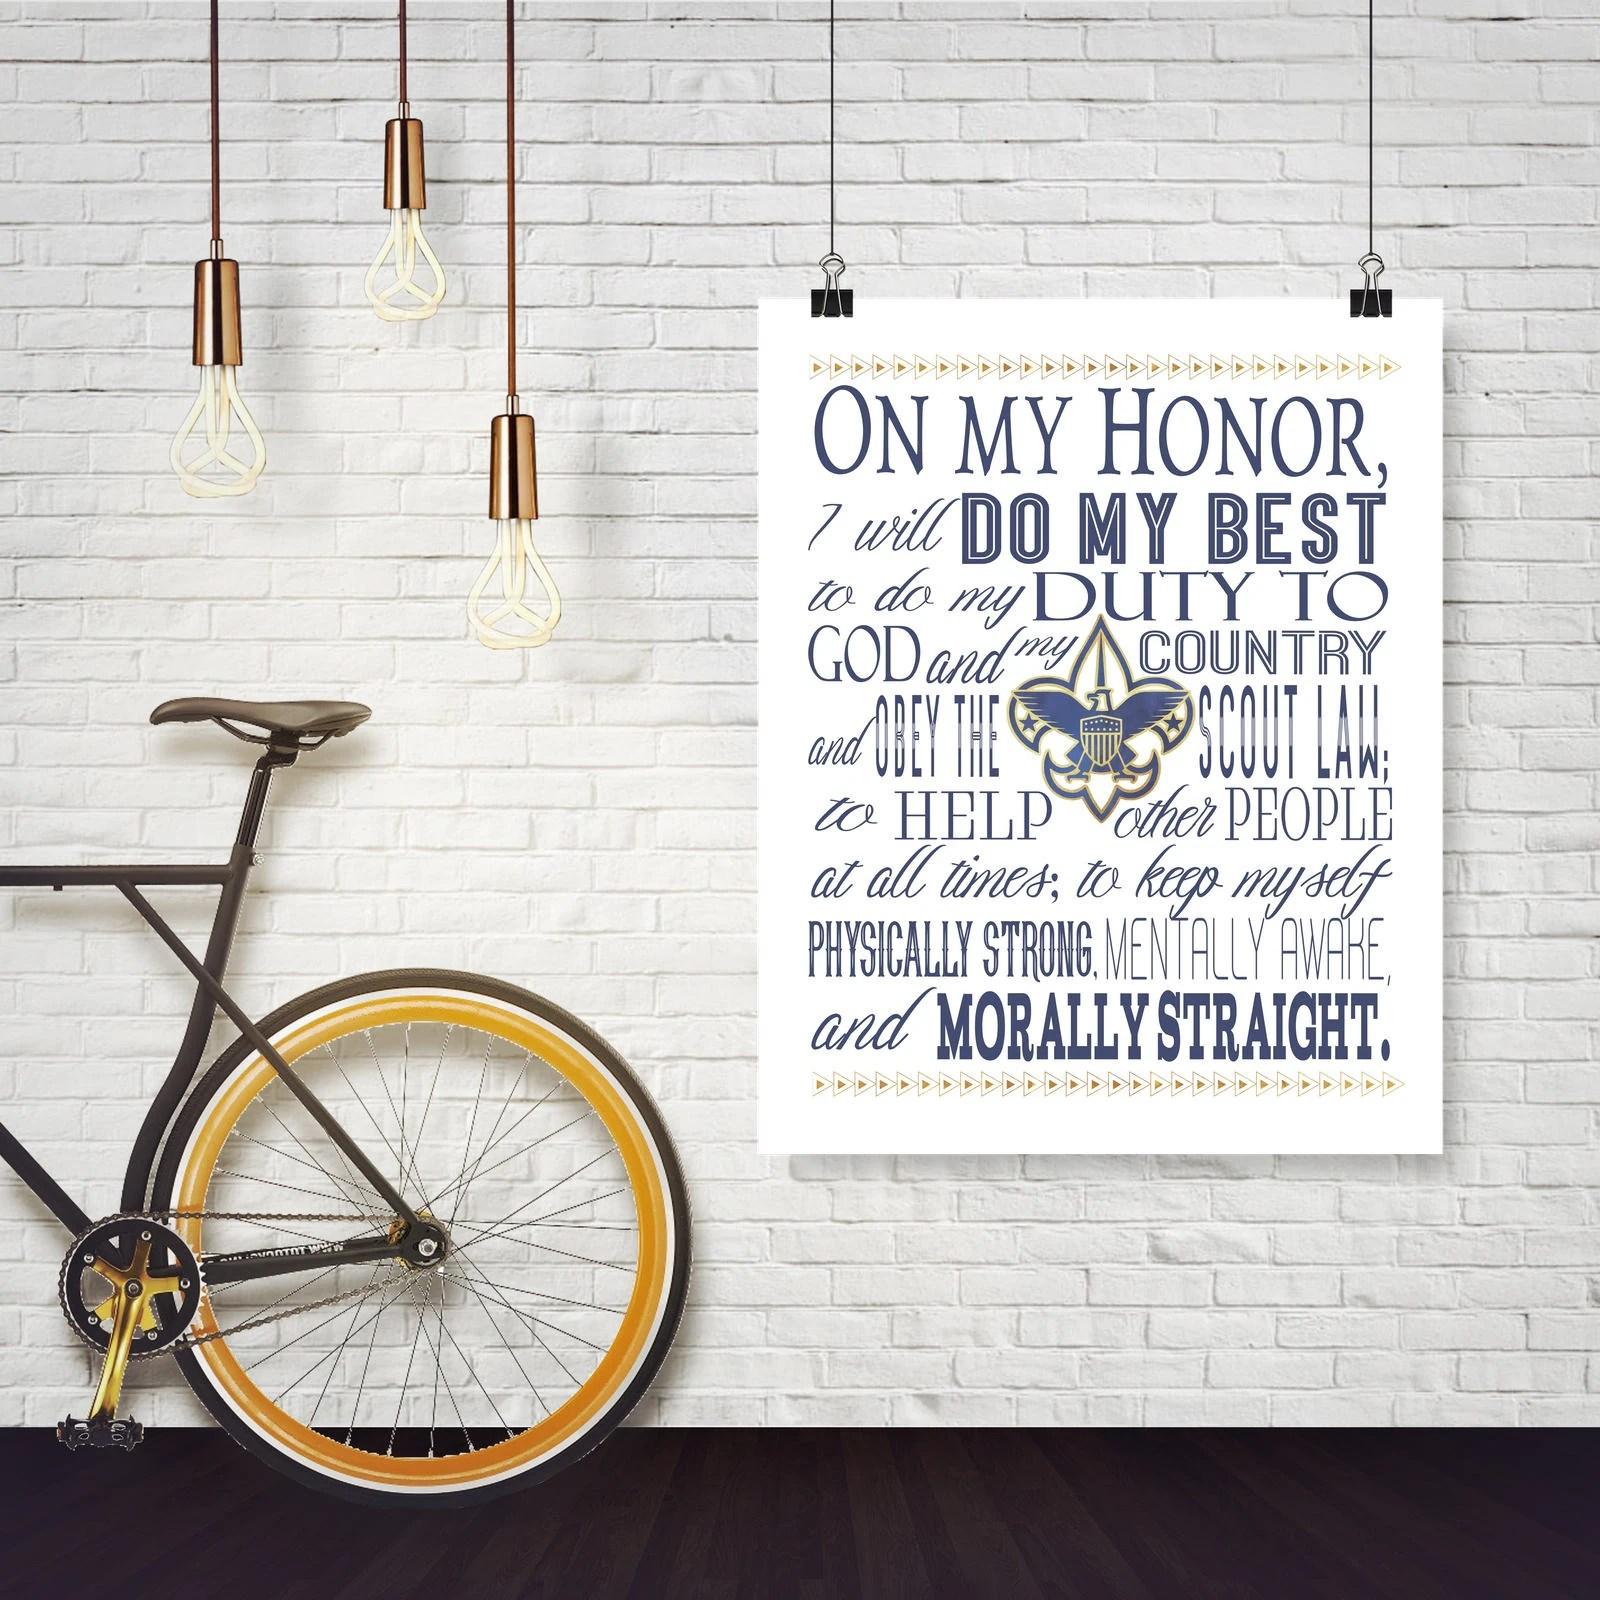 Boy Scout Oath Poster Navy Digital Printable Art